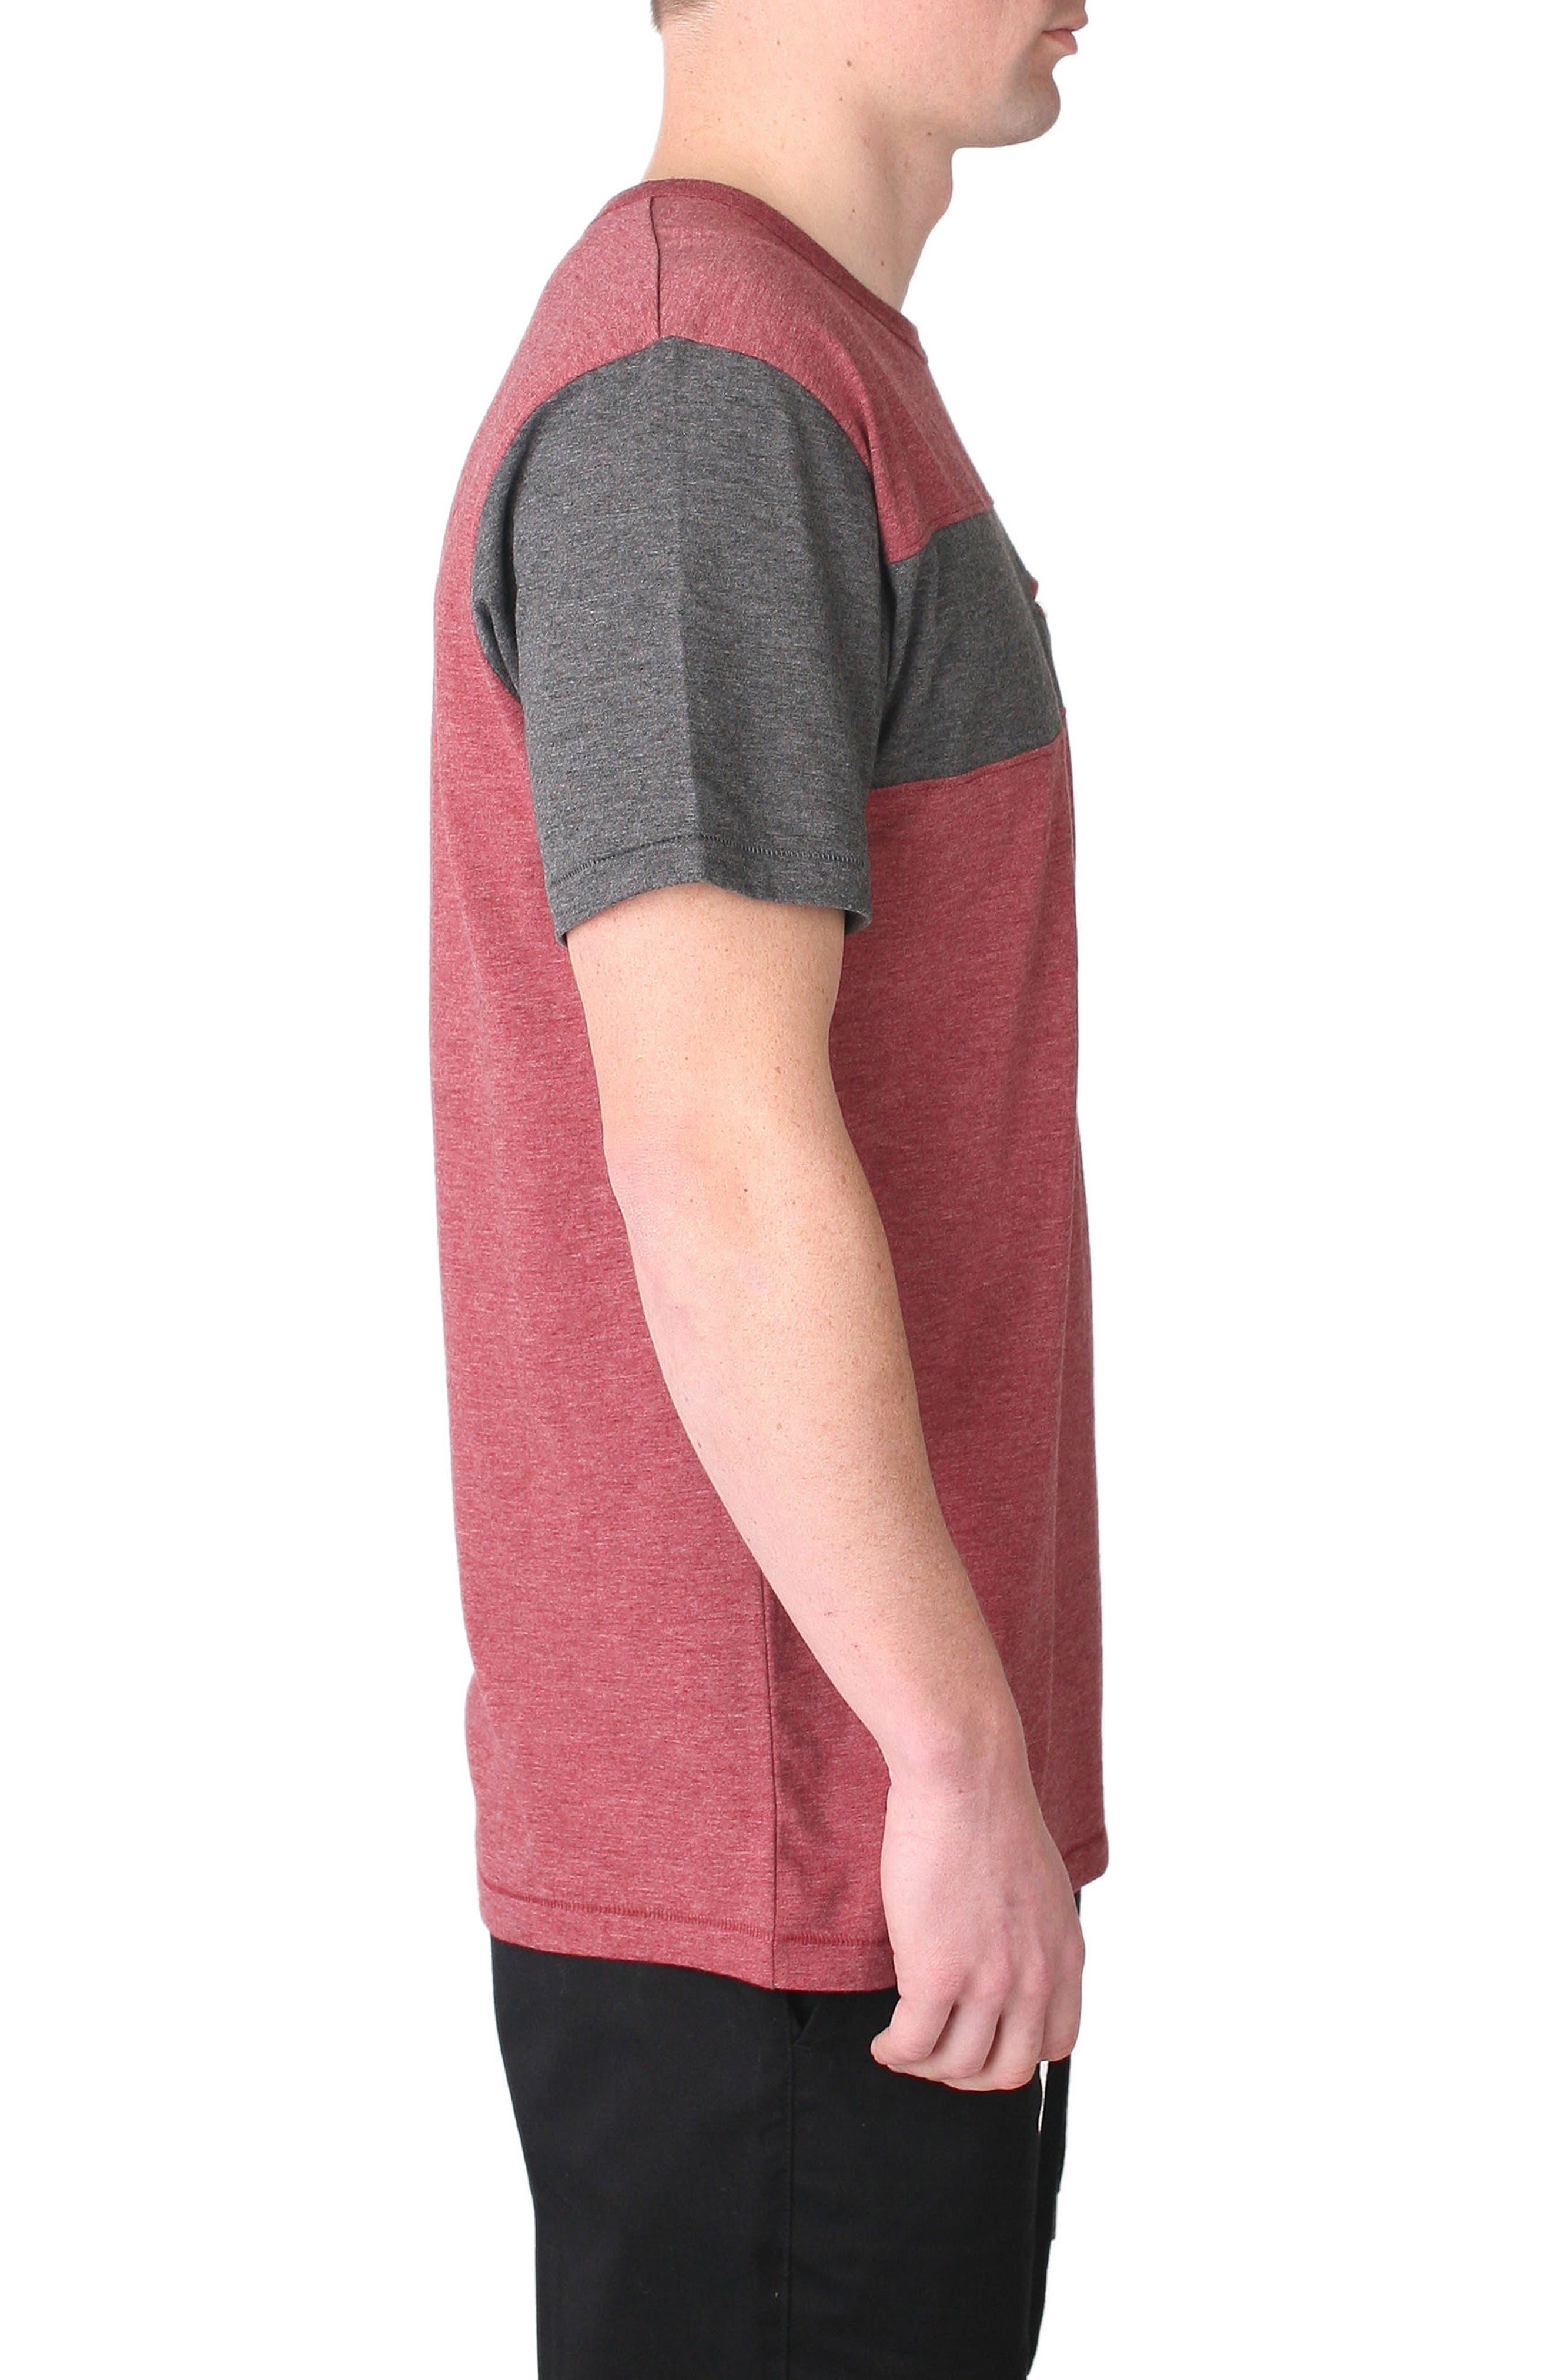 Nelson Pocket T-Shirt,                             Alternate thumbnail 3, color,                             Oxblood/ Charcoal